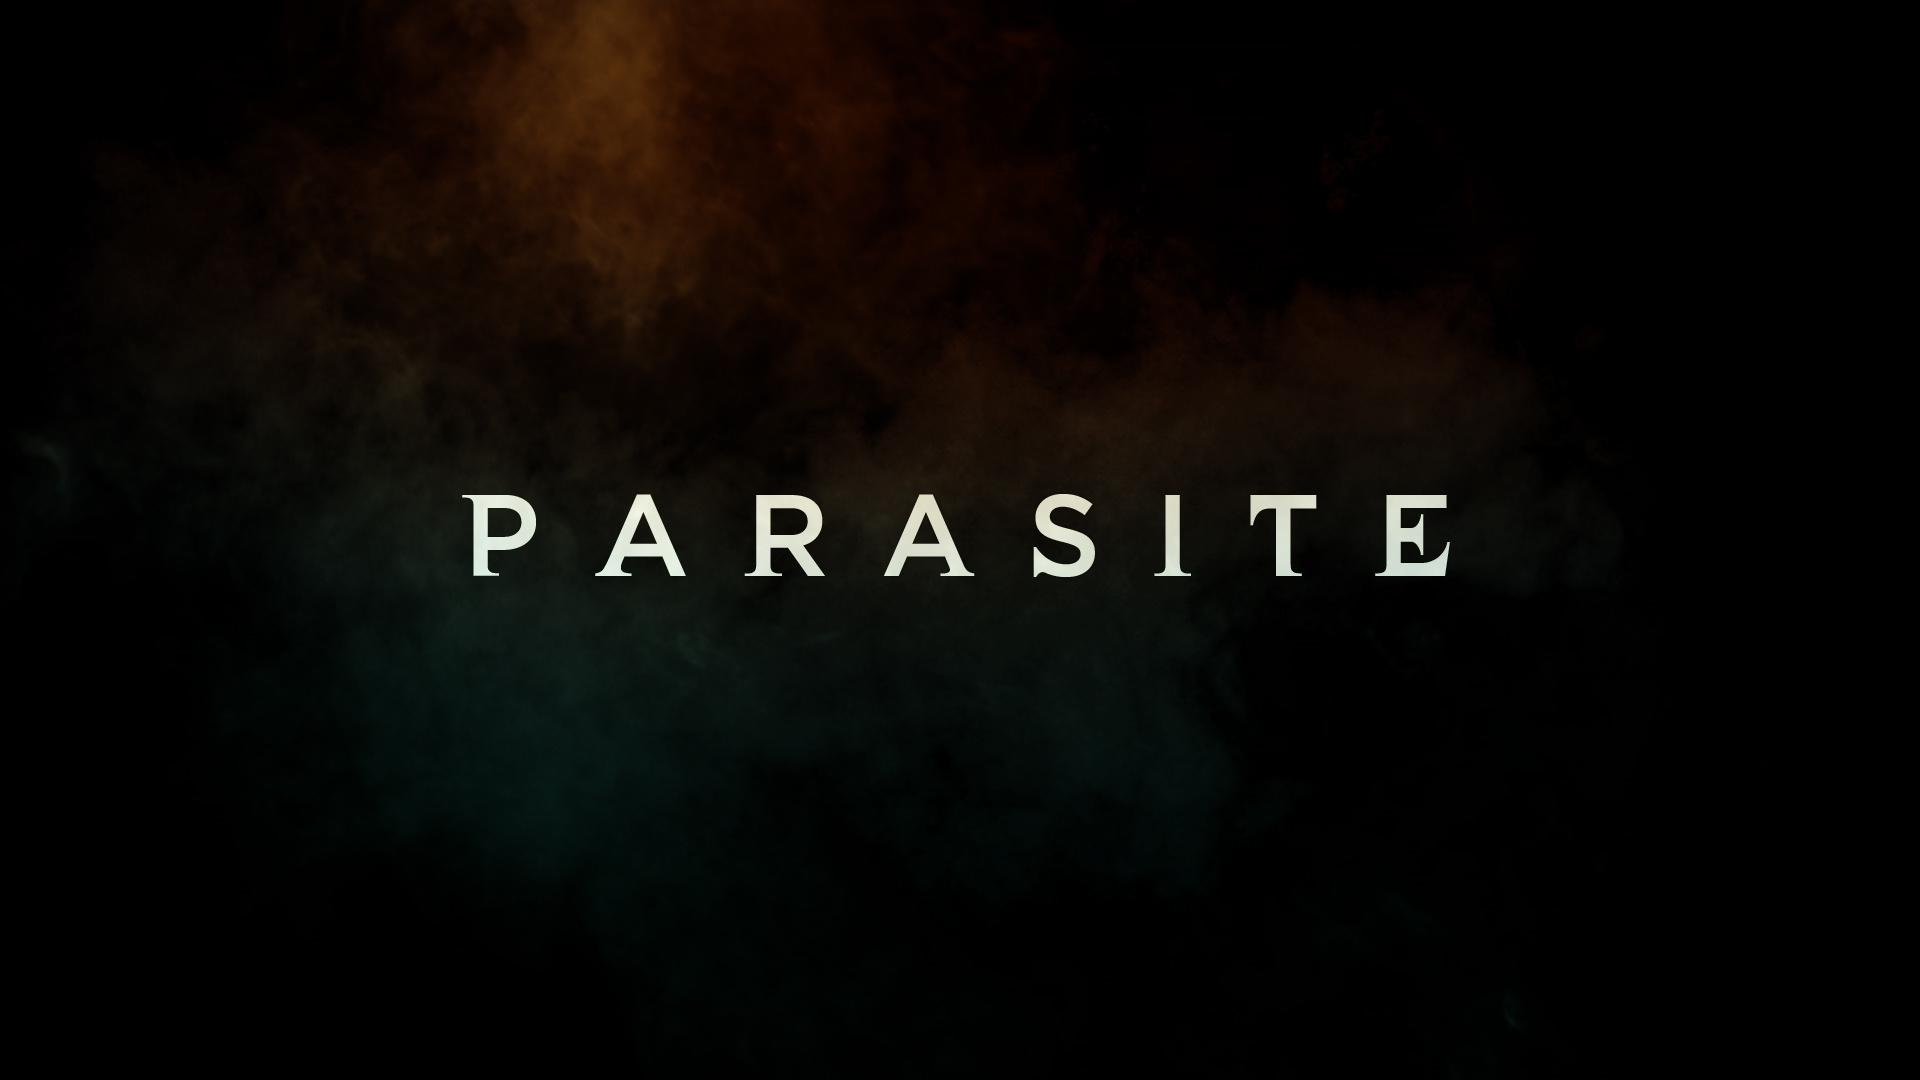 Thumbnail for Parasite